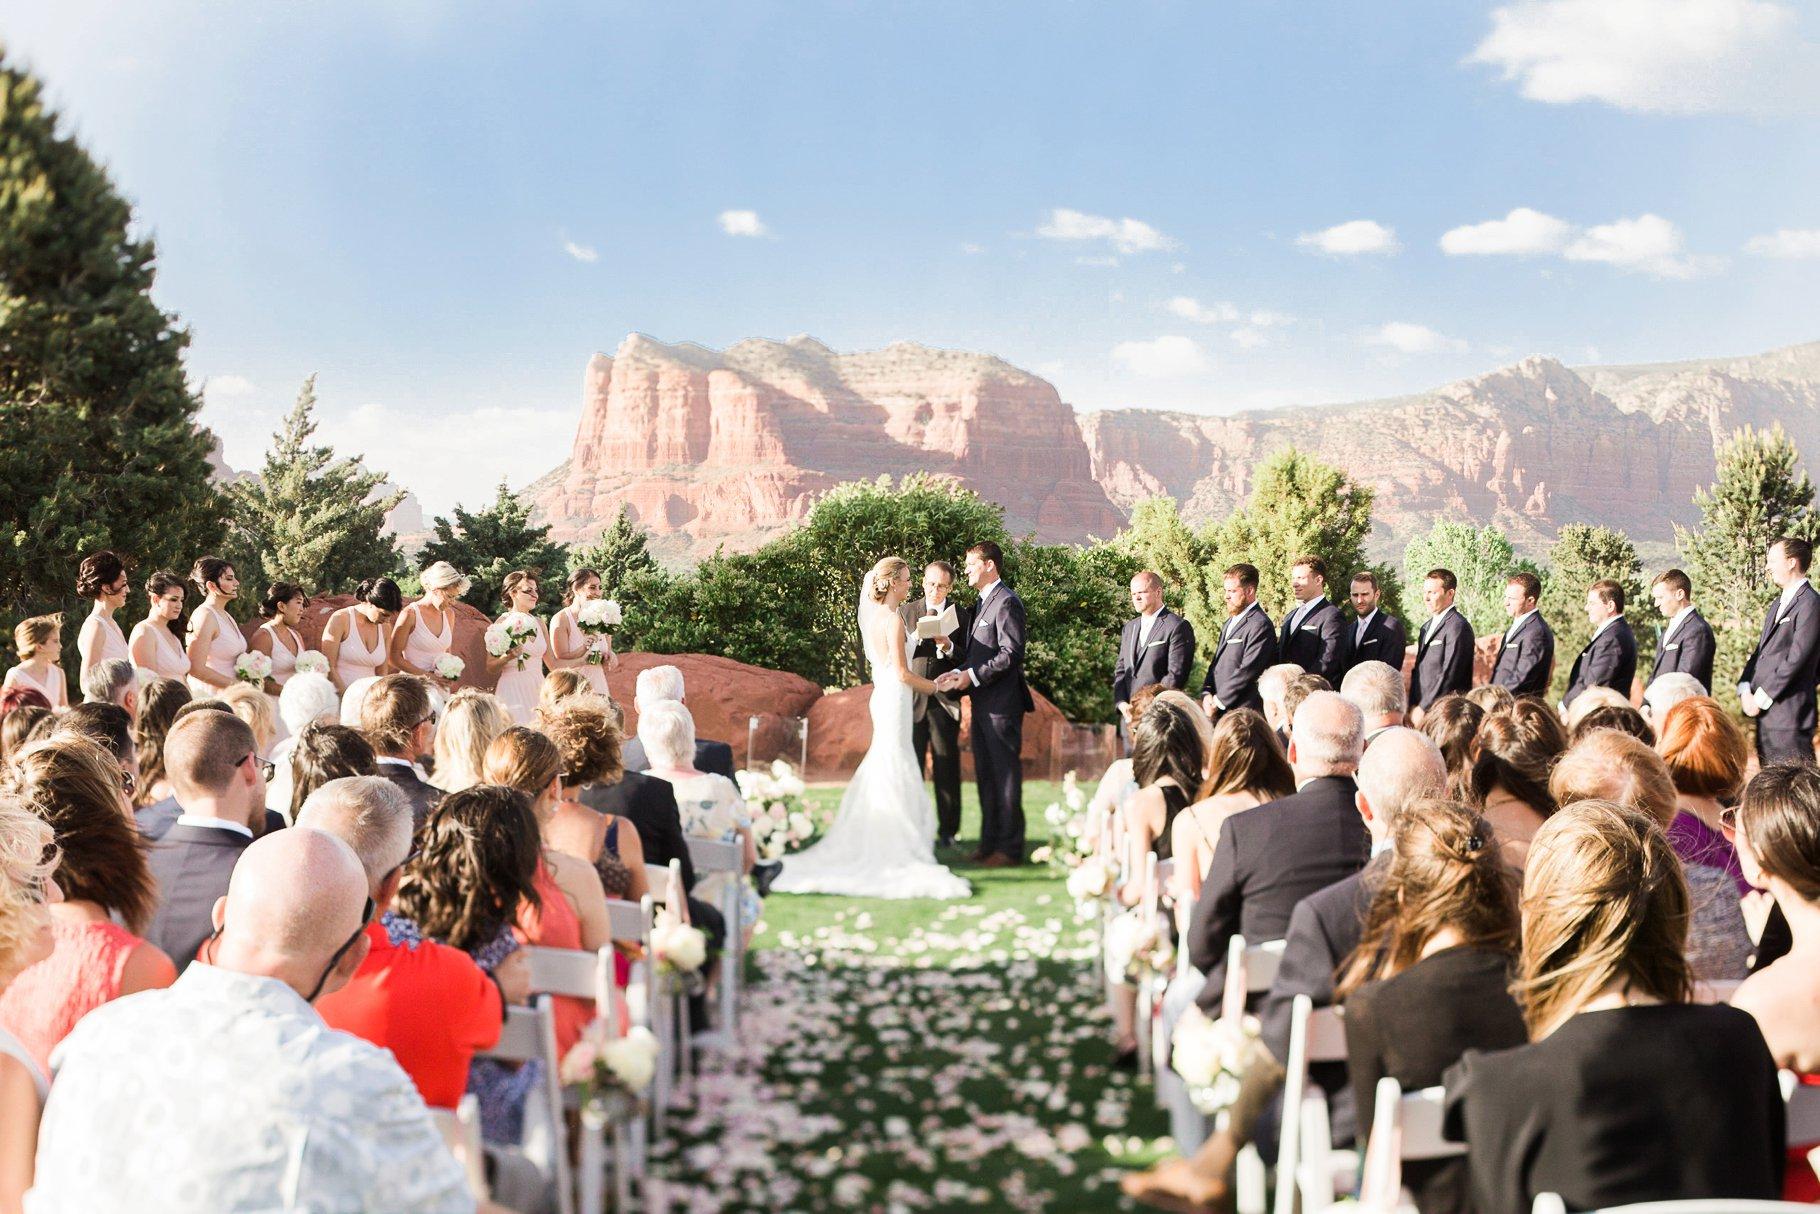 sedona wedding-79_GRETCHEN WAKEMAN PHOTOGRAPHY.jpg